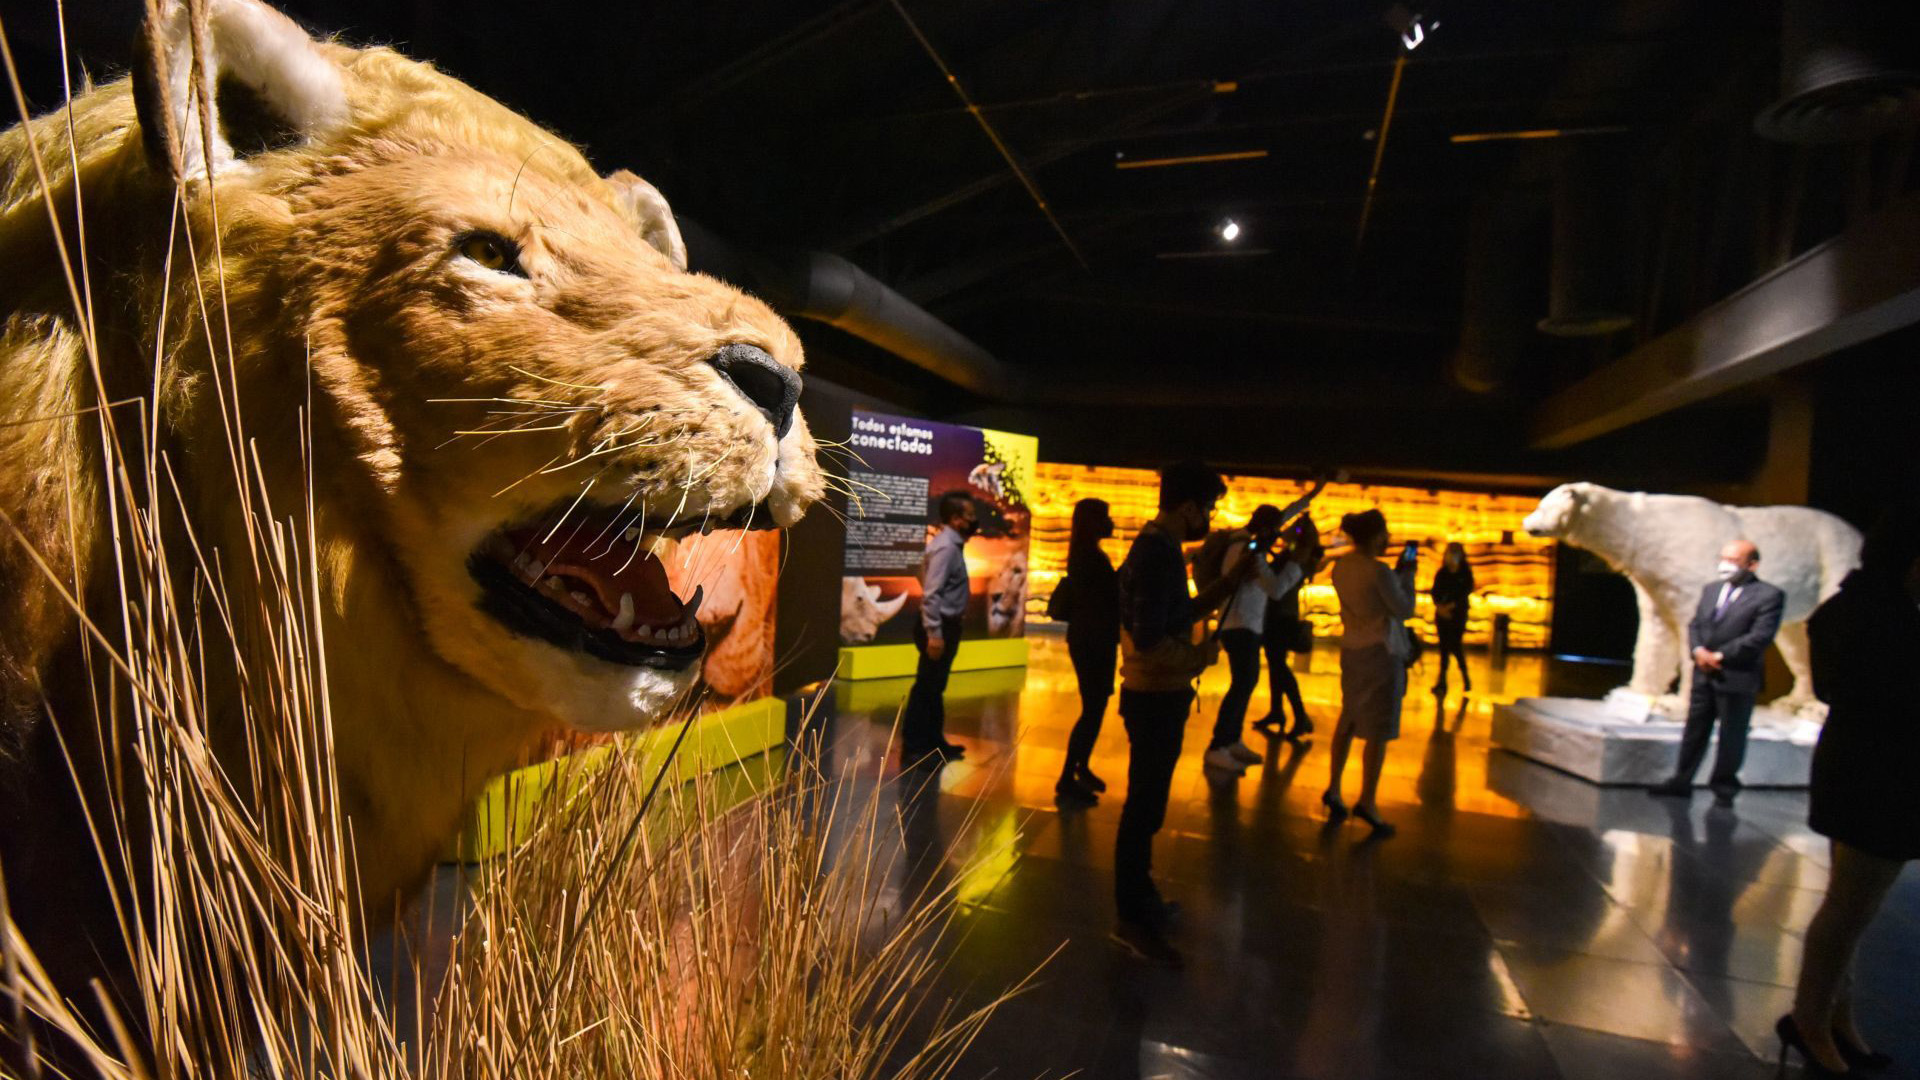 Centro-Cultural-Toluca-abre-sus-puertas-al-publico